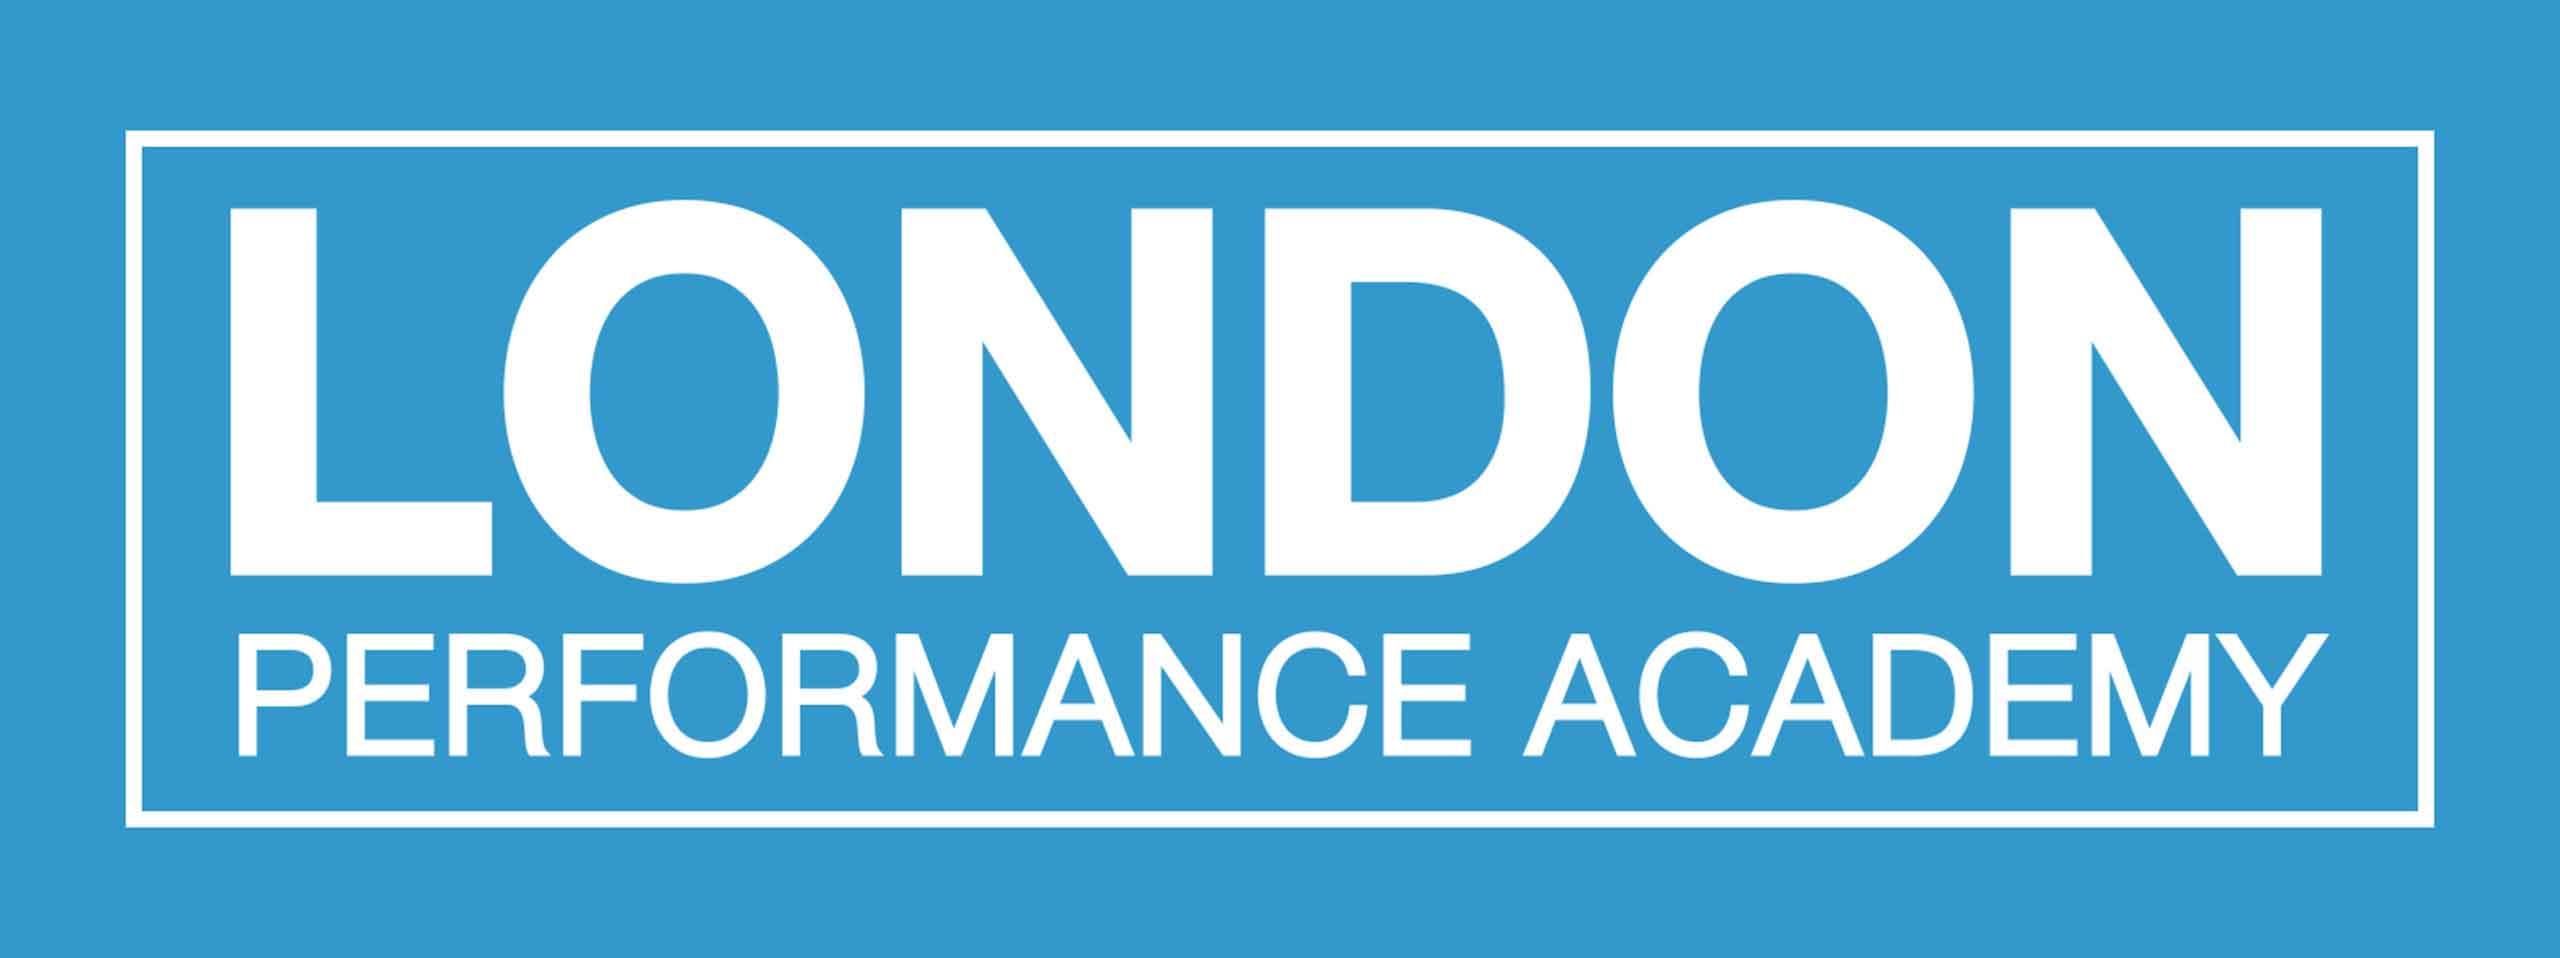 London Performance Academy Logo - Branding by Kulmedia Digital Studio